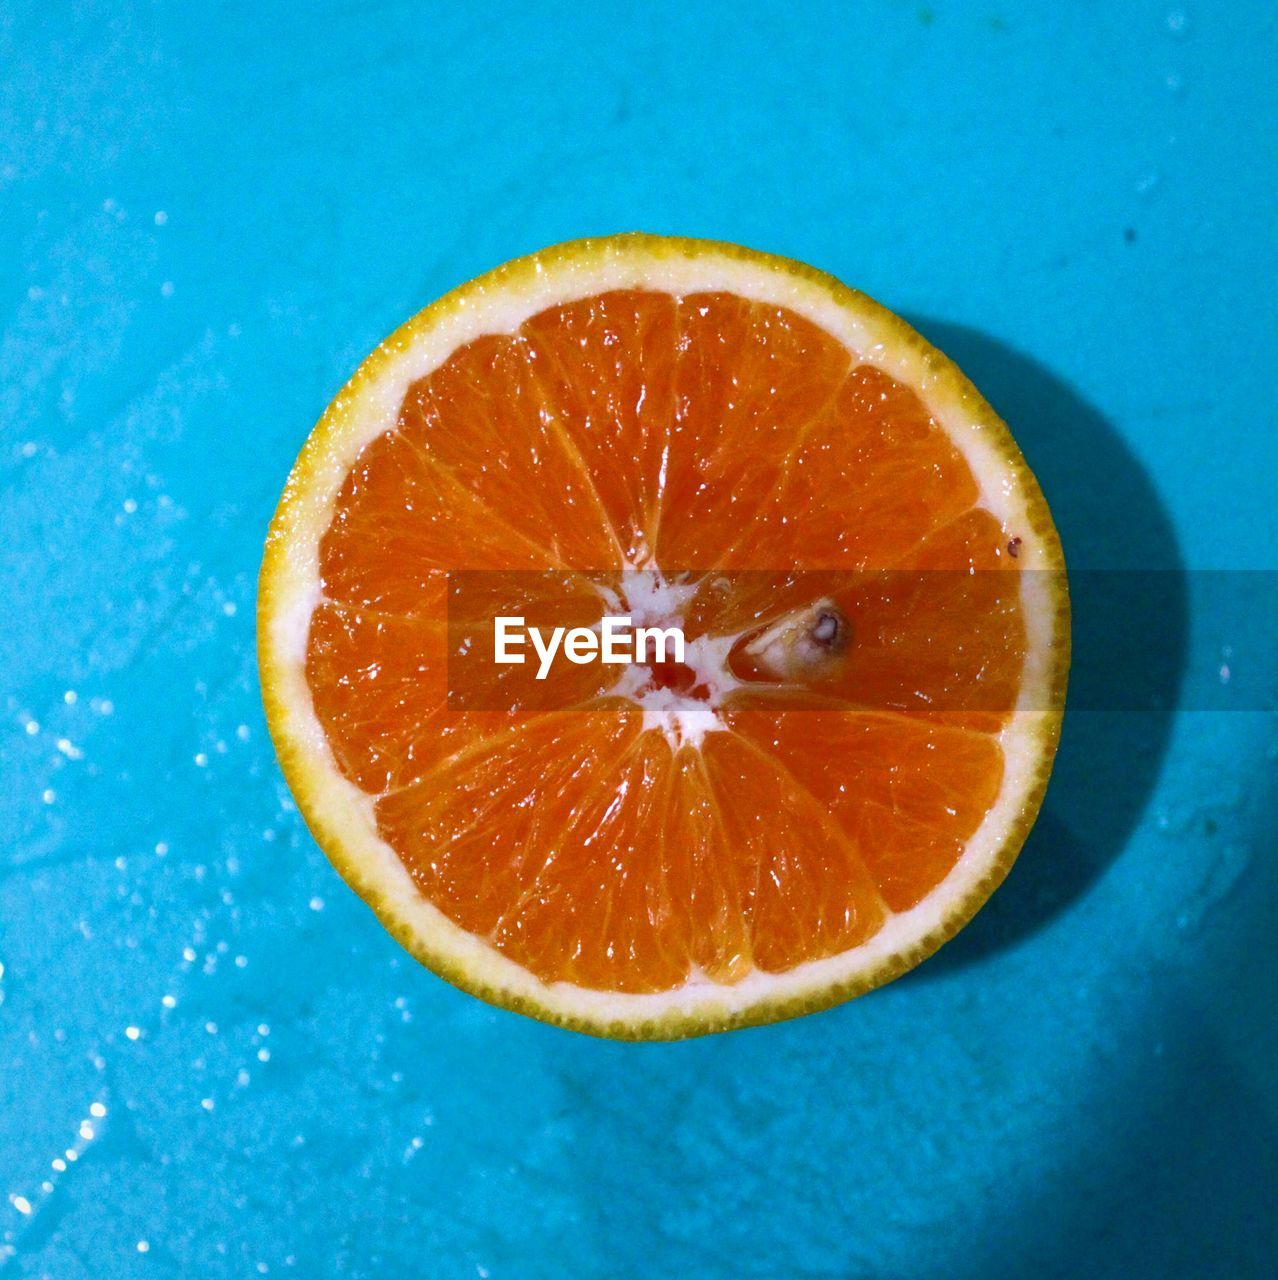 fruit, citrus fruit, healthy eating, food, food and drink, slice, orange color, freshness, wellbeing, orange, cross section, close-up, orange - fruit, studio shot, indoors, colored background, no people, juicy, blue, still life, ripe, blue background, antioxidant, vitamin c